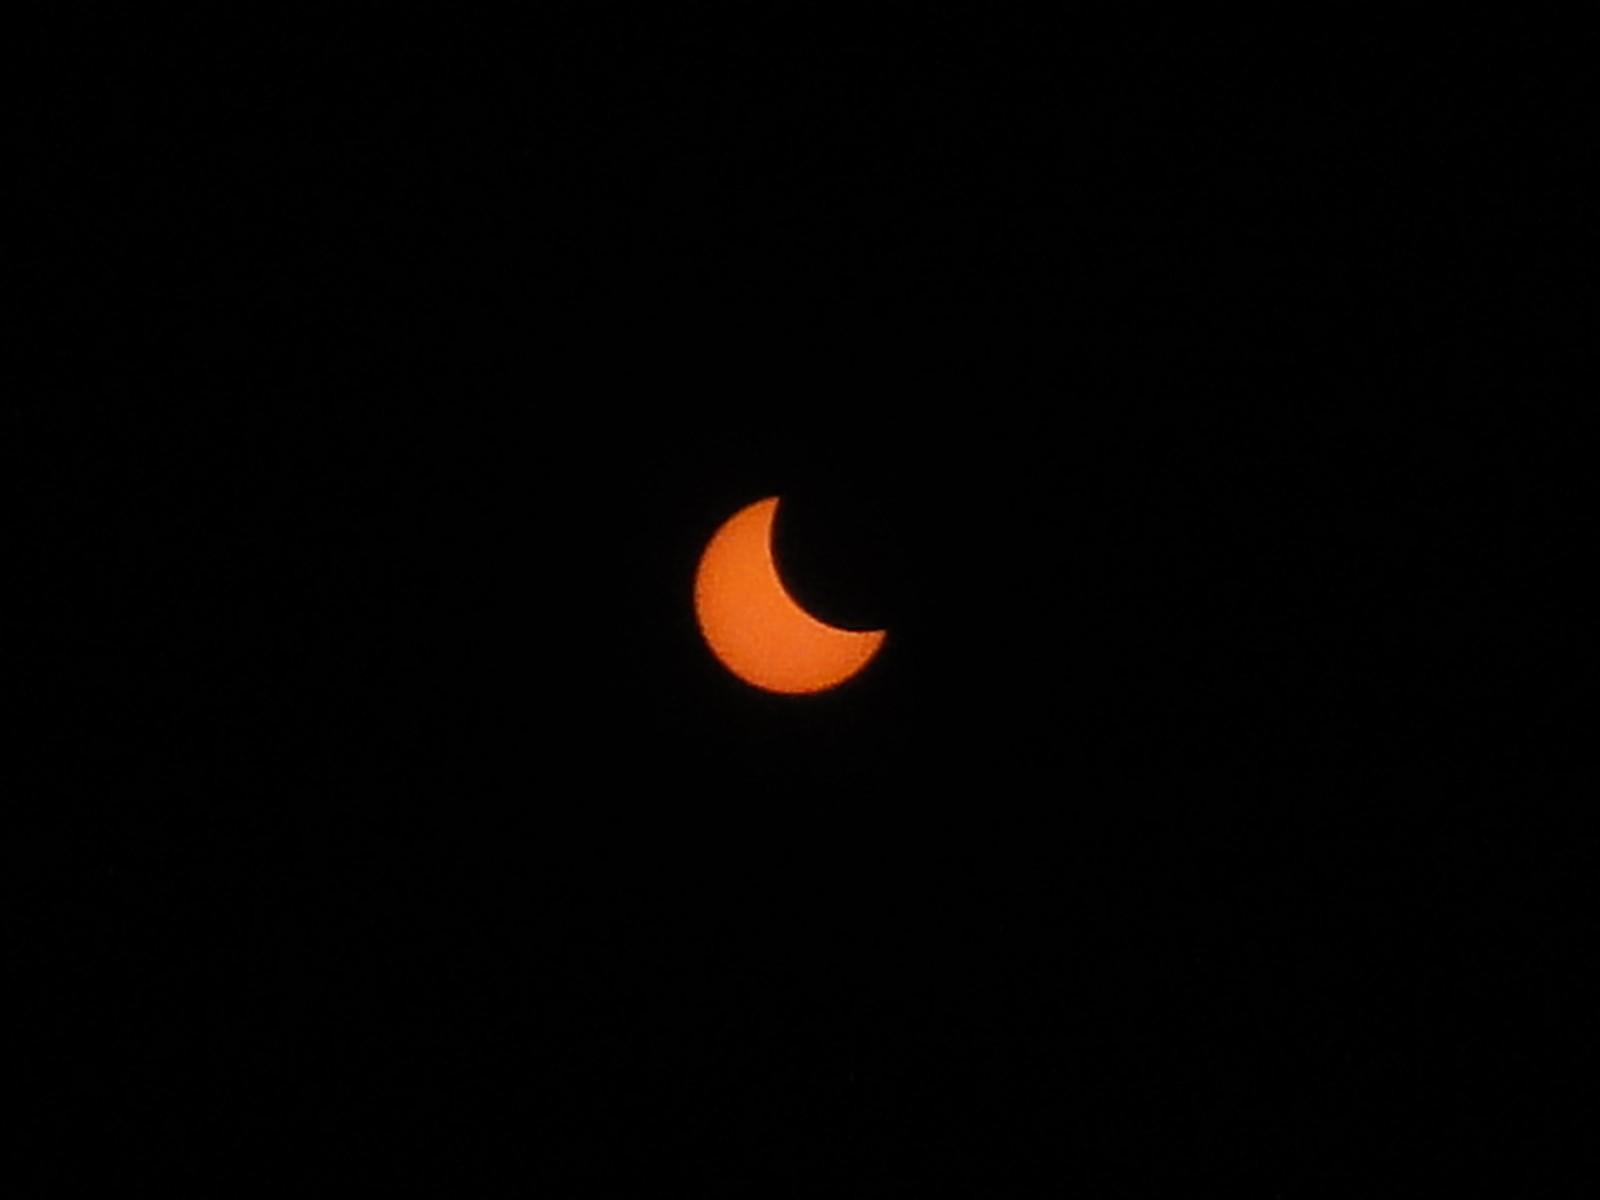 Solar_Eclipse_005.jpg